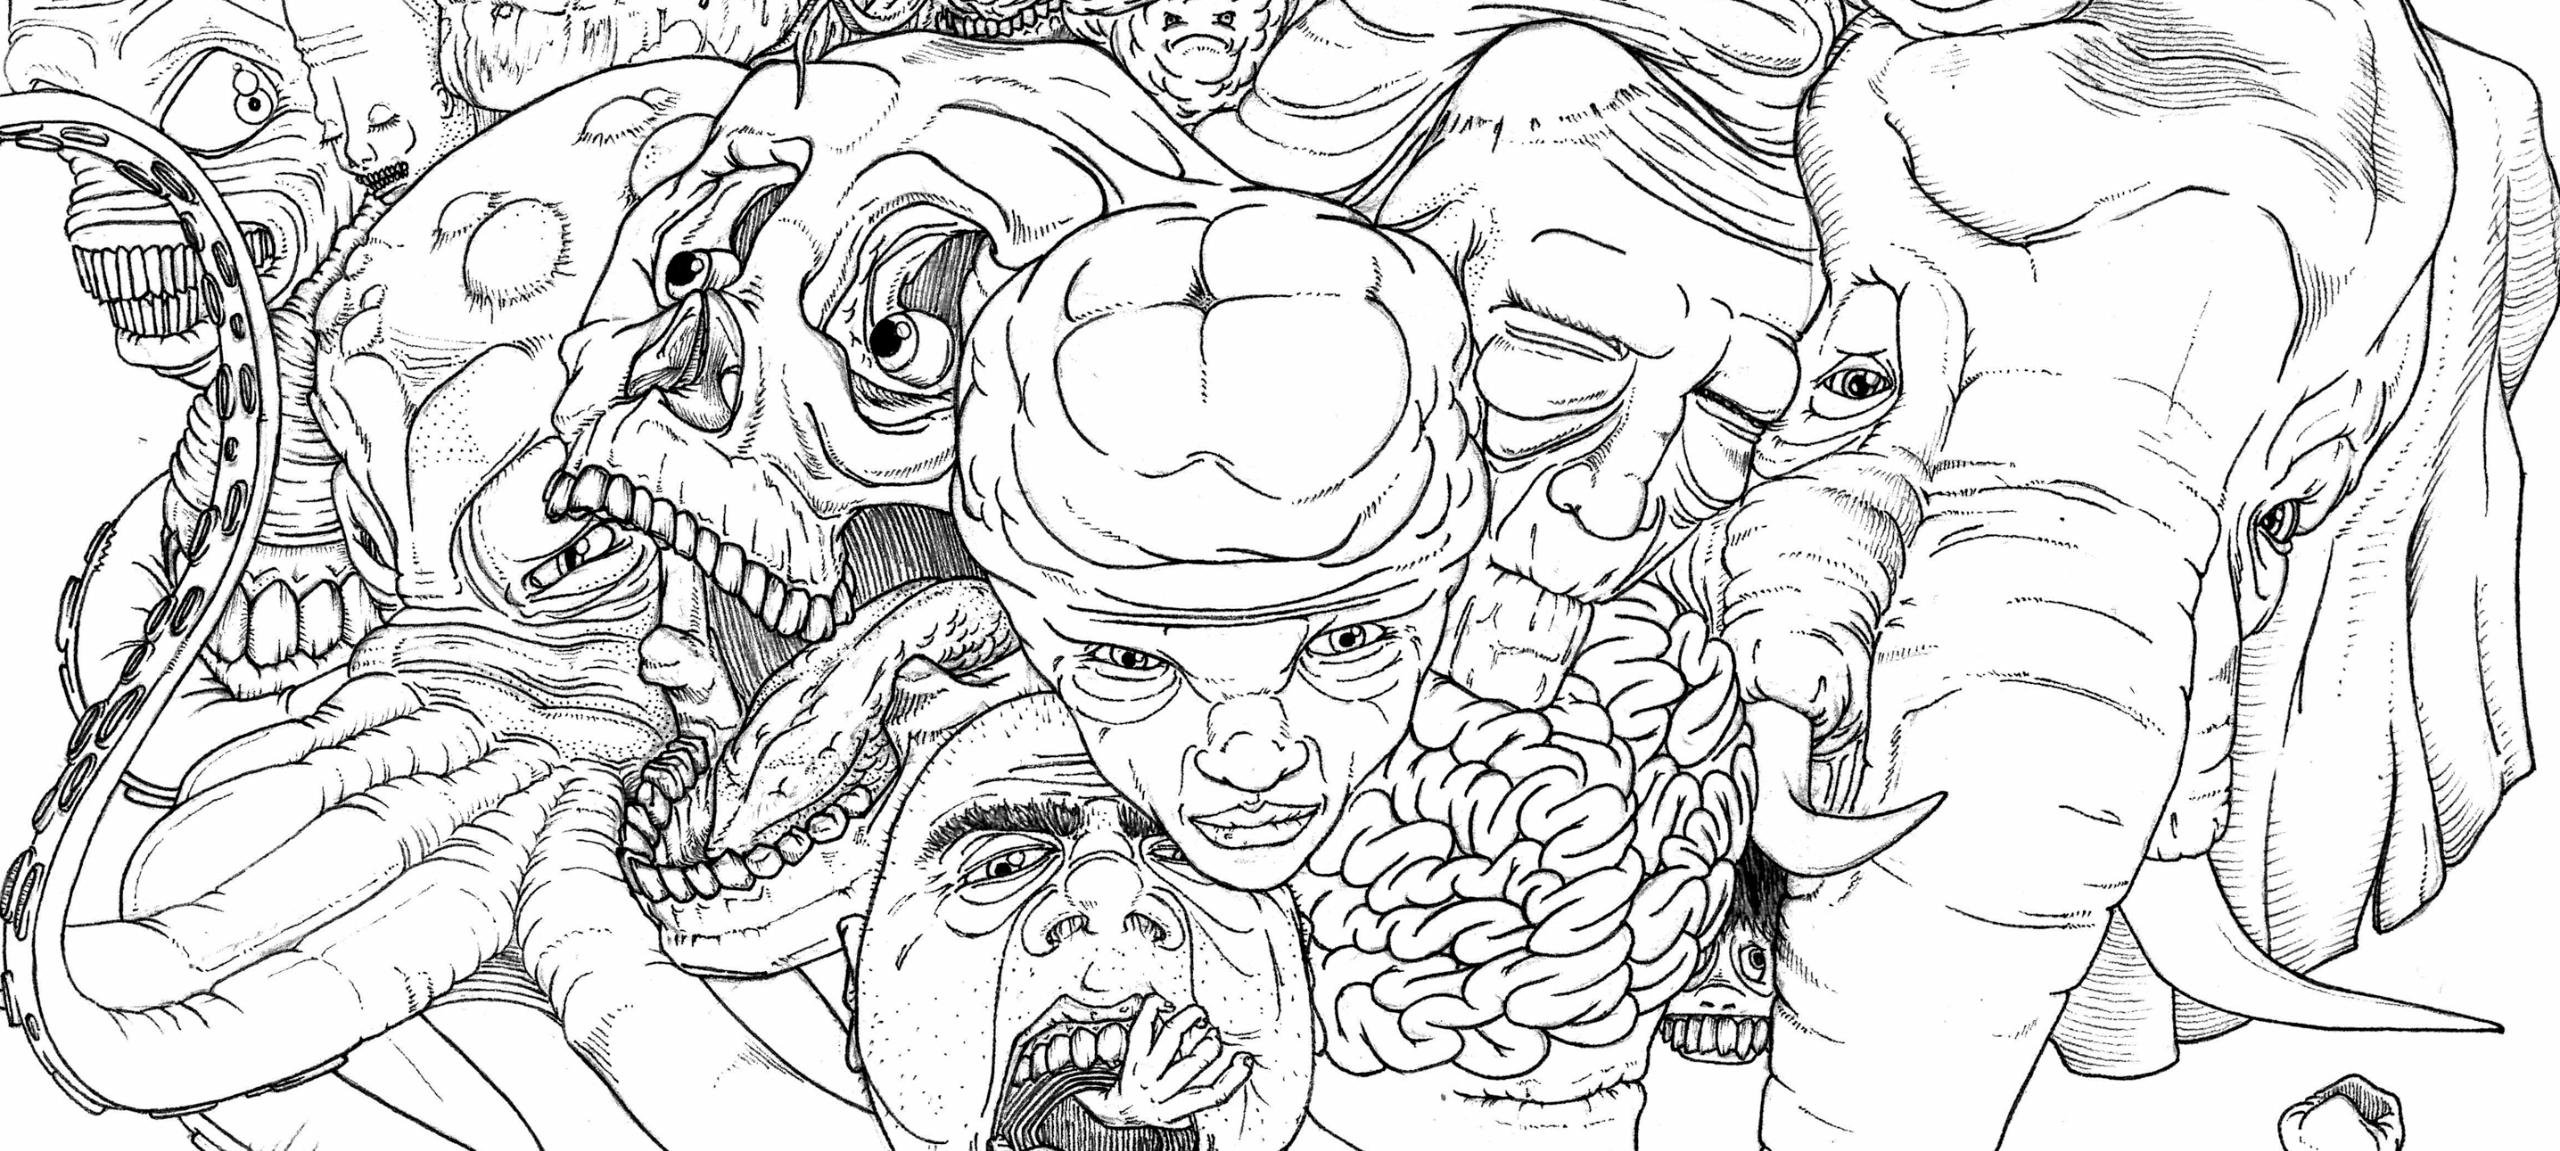 Aaron Bass - Third Eye Creative (@thirdeyecreative) Cover Image